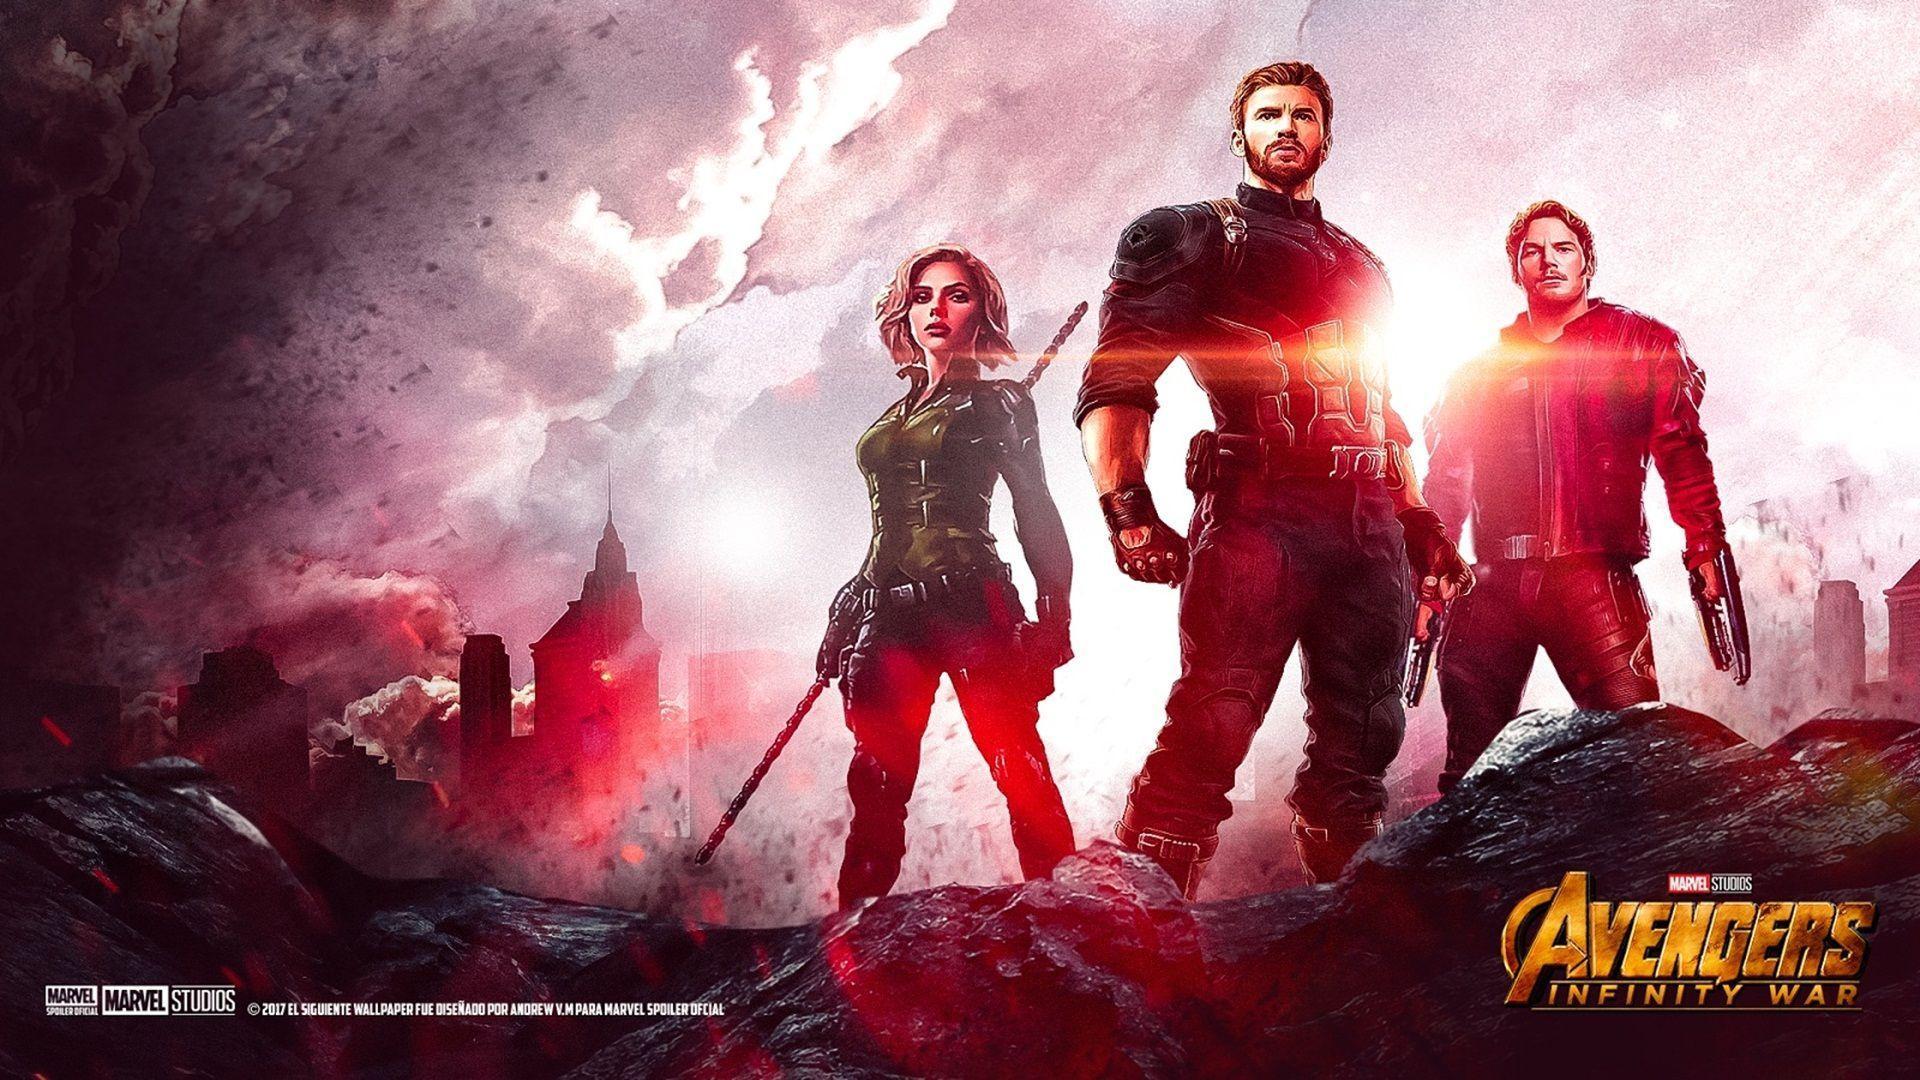 Avengers Infinity Wallpapers Top Free Avengers Infinity